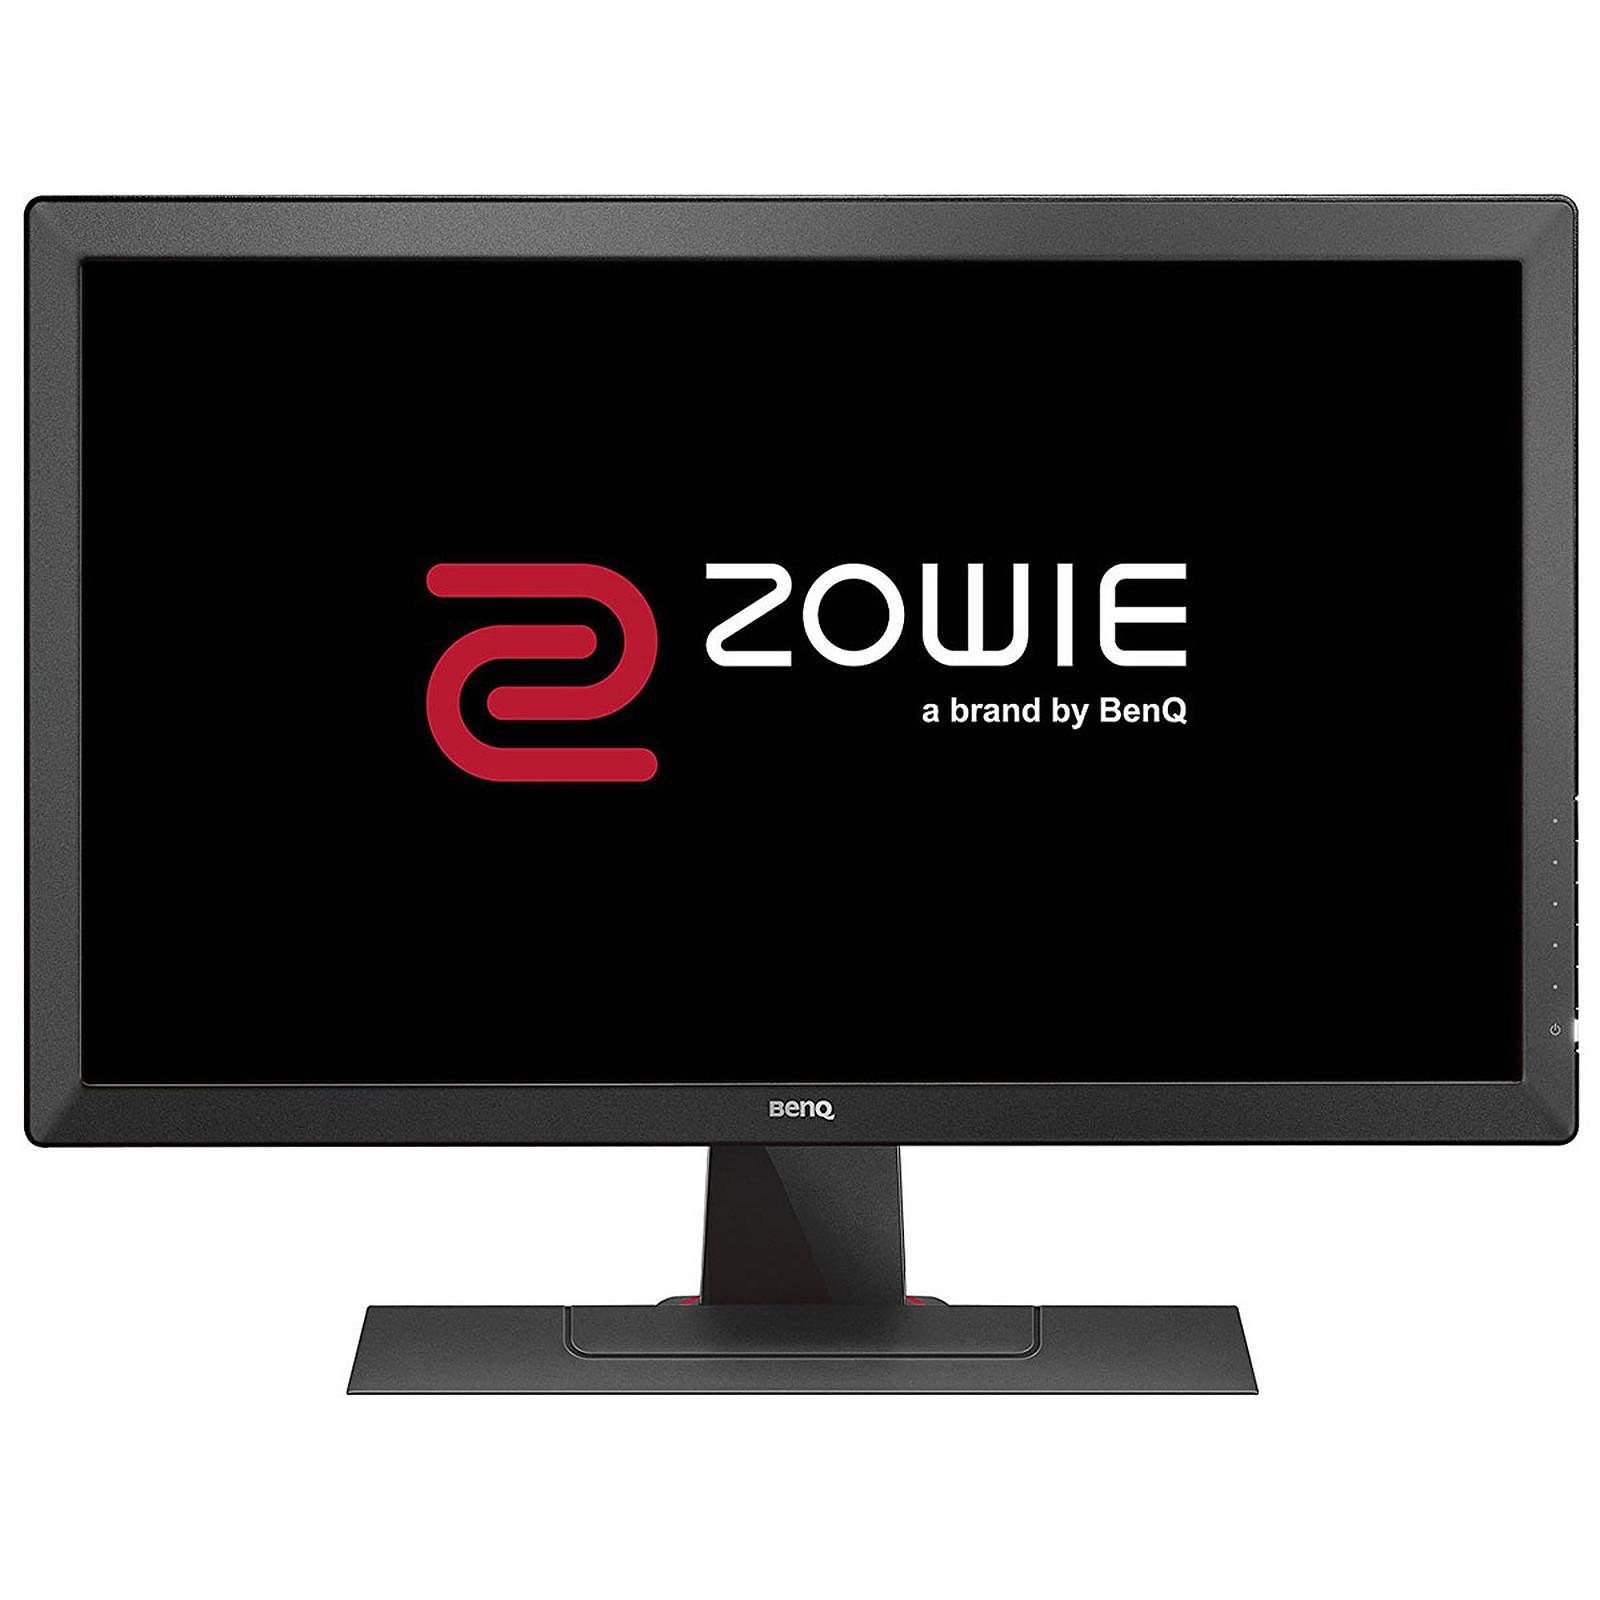 "BenQ Zowie 24"" LED - RL2455"